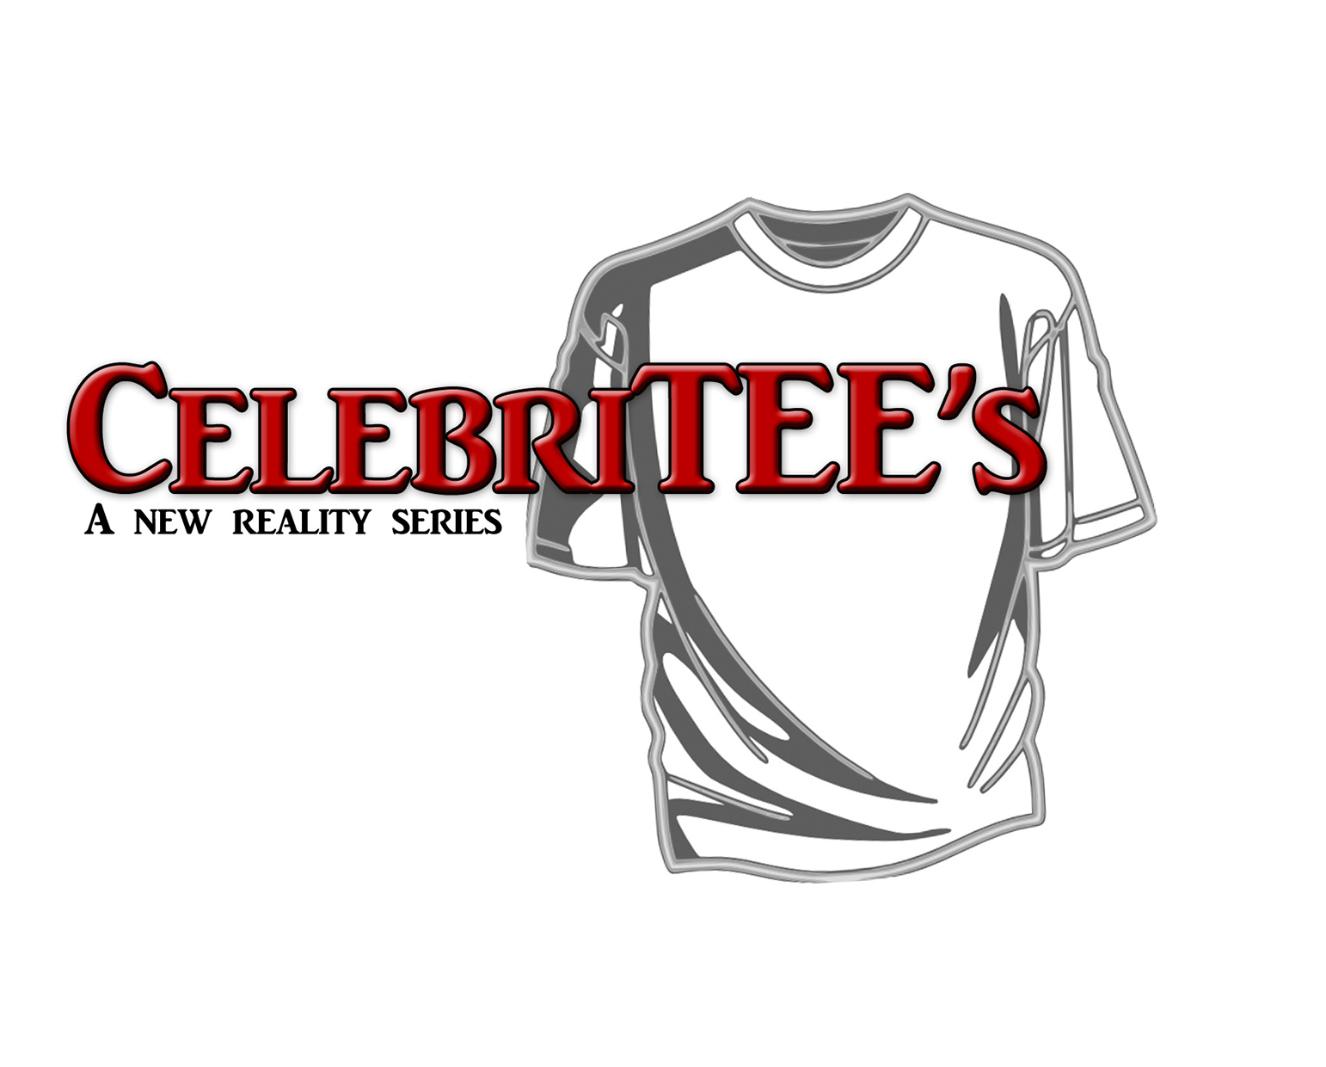 CelebriTees Reality Show